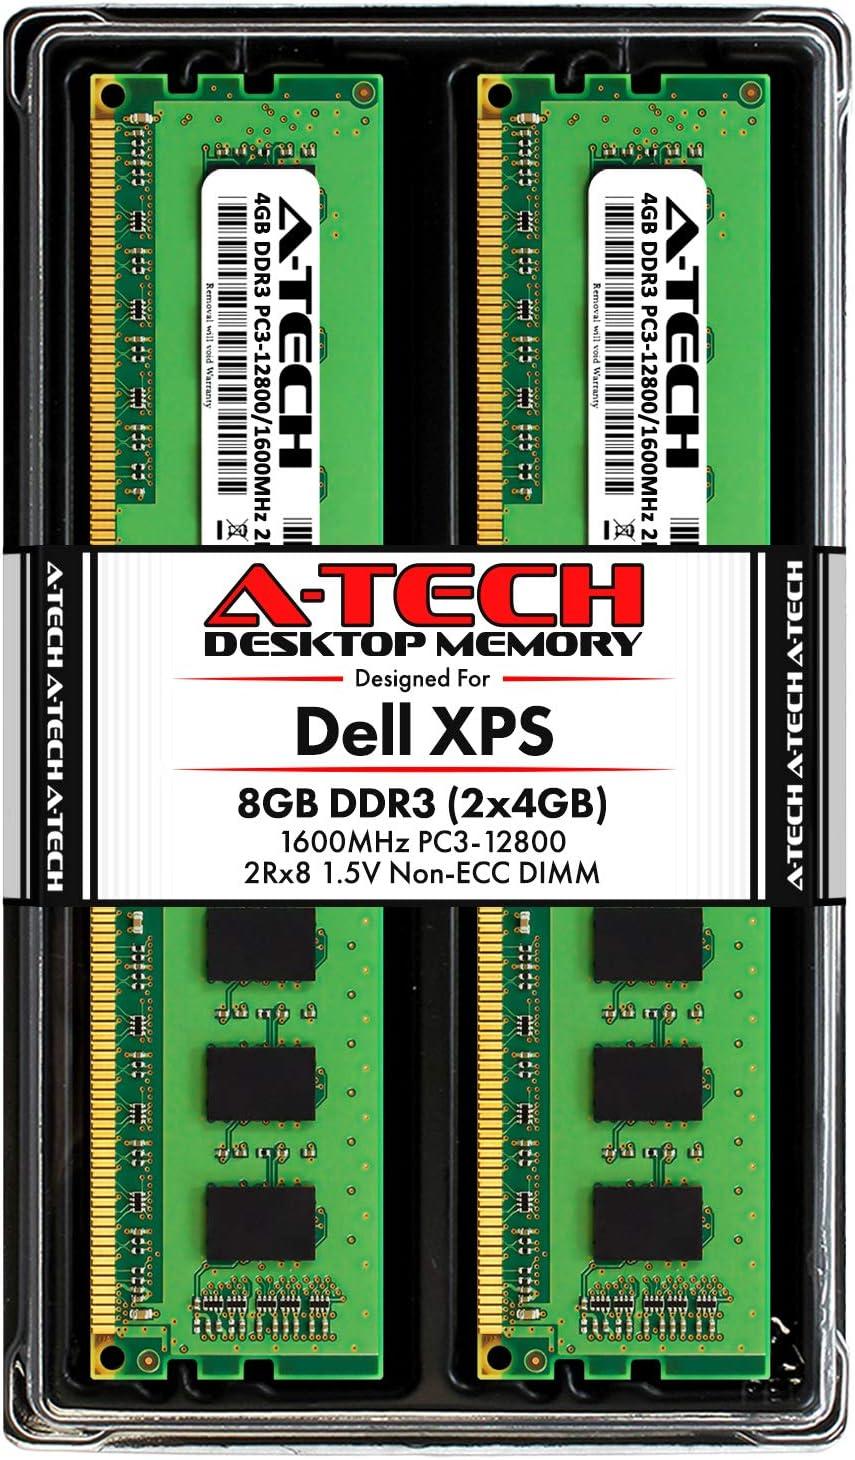 A-Tech 8GB RAM Kit for Dell XPS 8700, 8500 - (2 x 4GB) DDR3 1600MHz PC3-12800 Non-ECC DIMM Memory Upgrade Modules